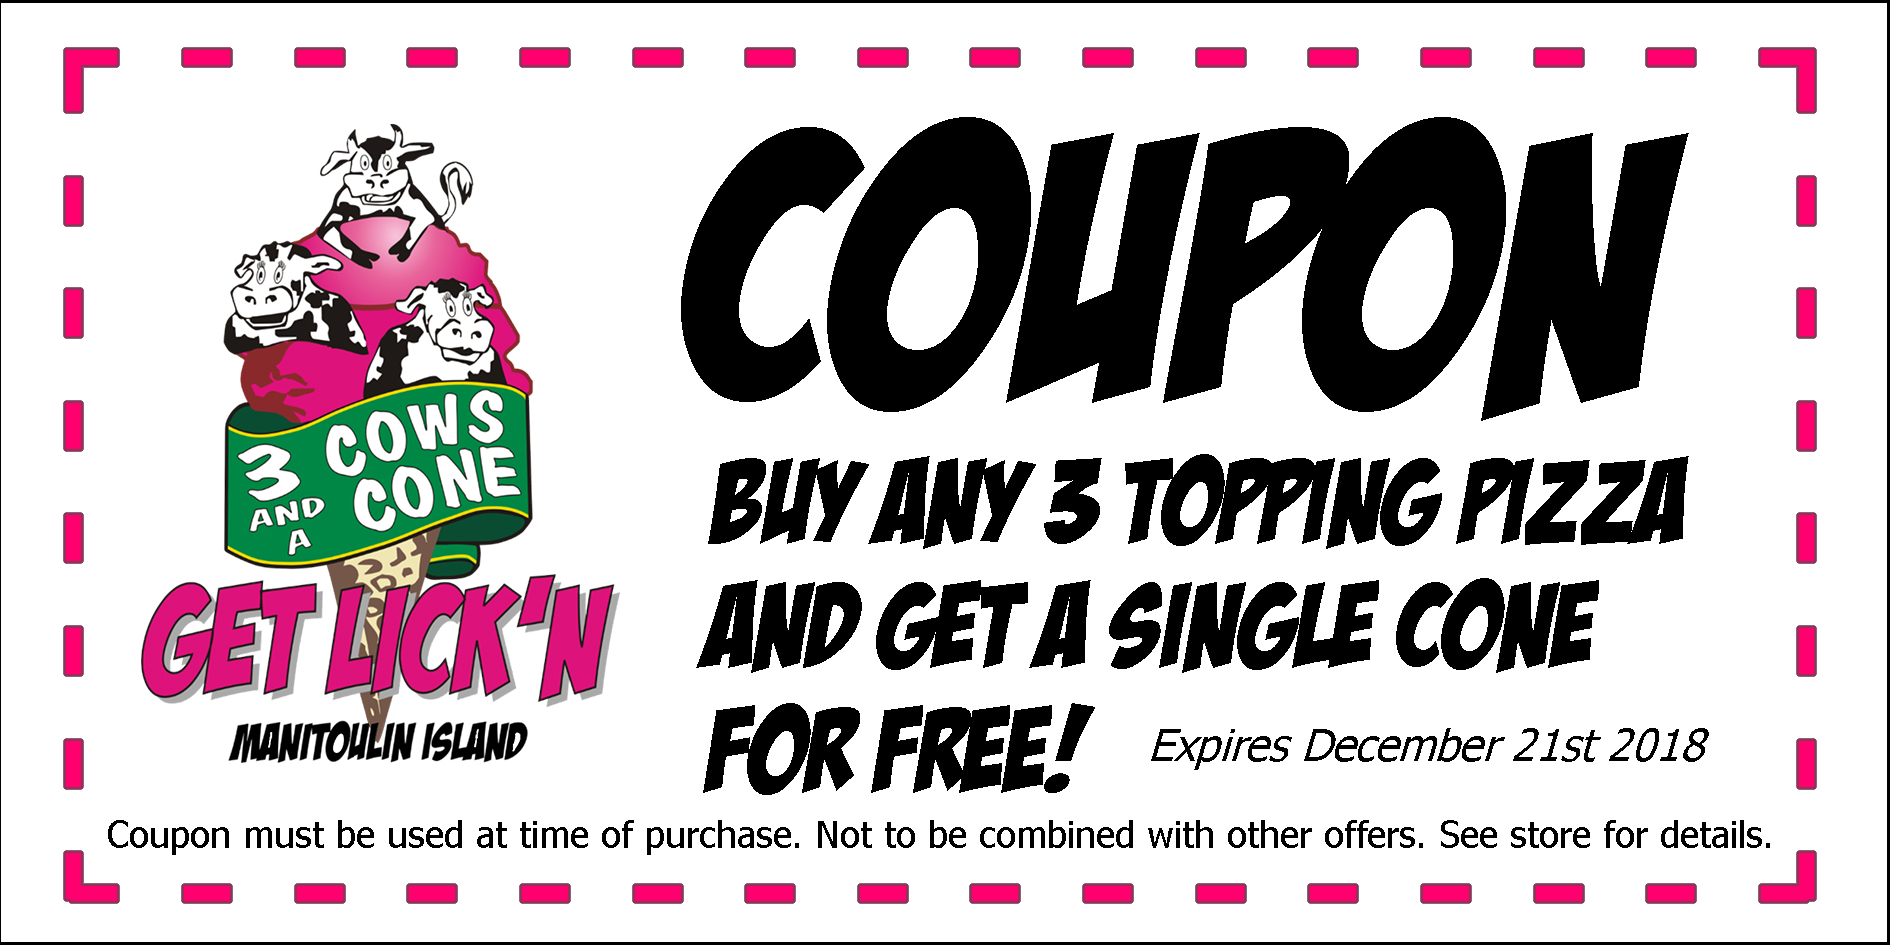 free cone coupon.jpg